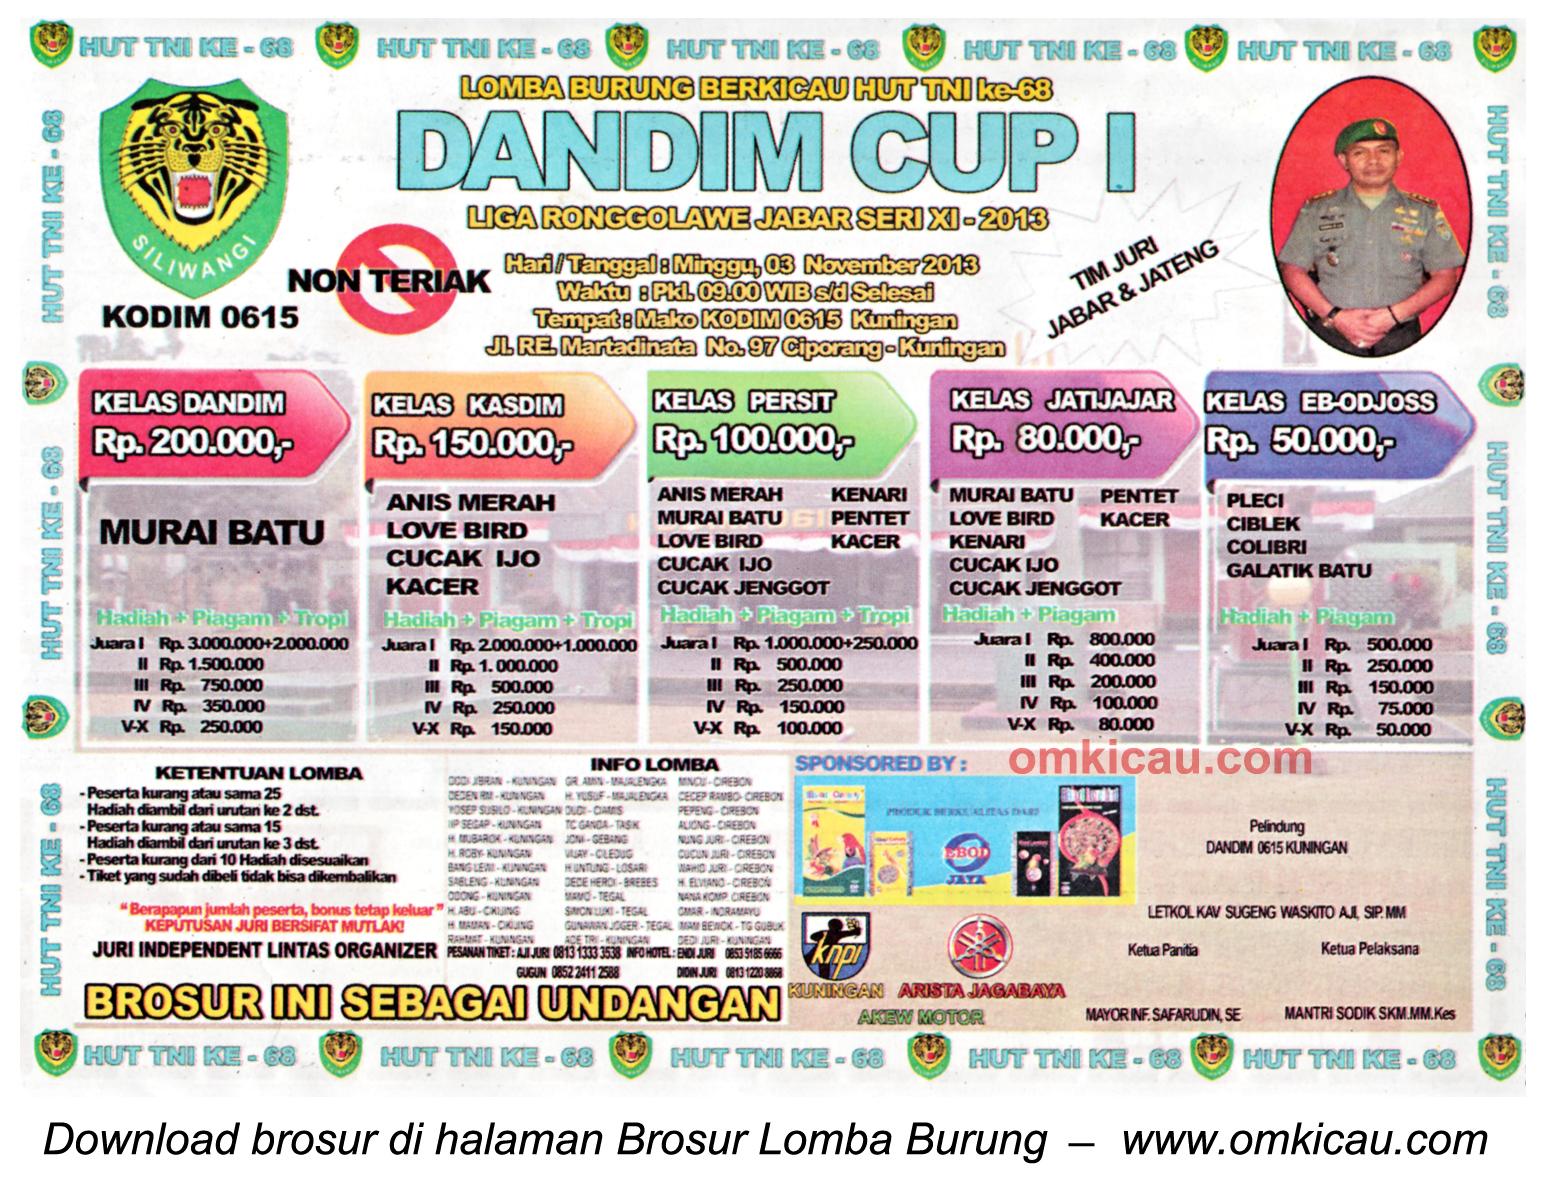 Brosur Lomba Burung Dandim Cup (LRJ 11), Kuningan, 3 November 2013